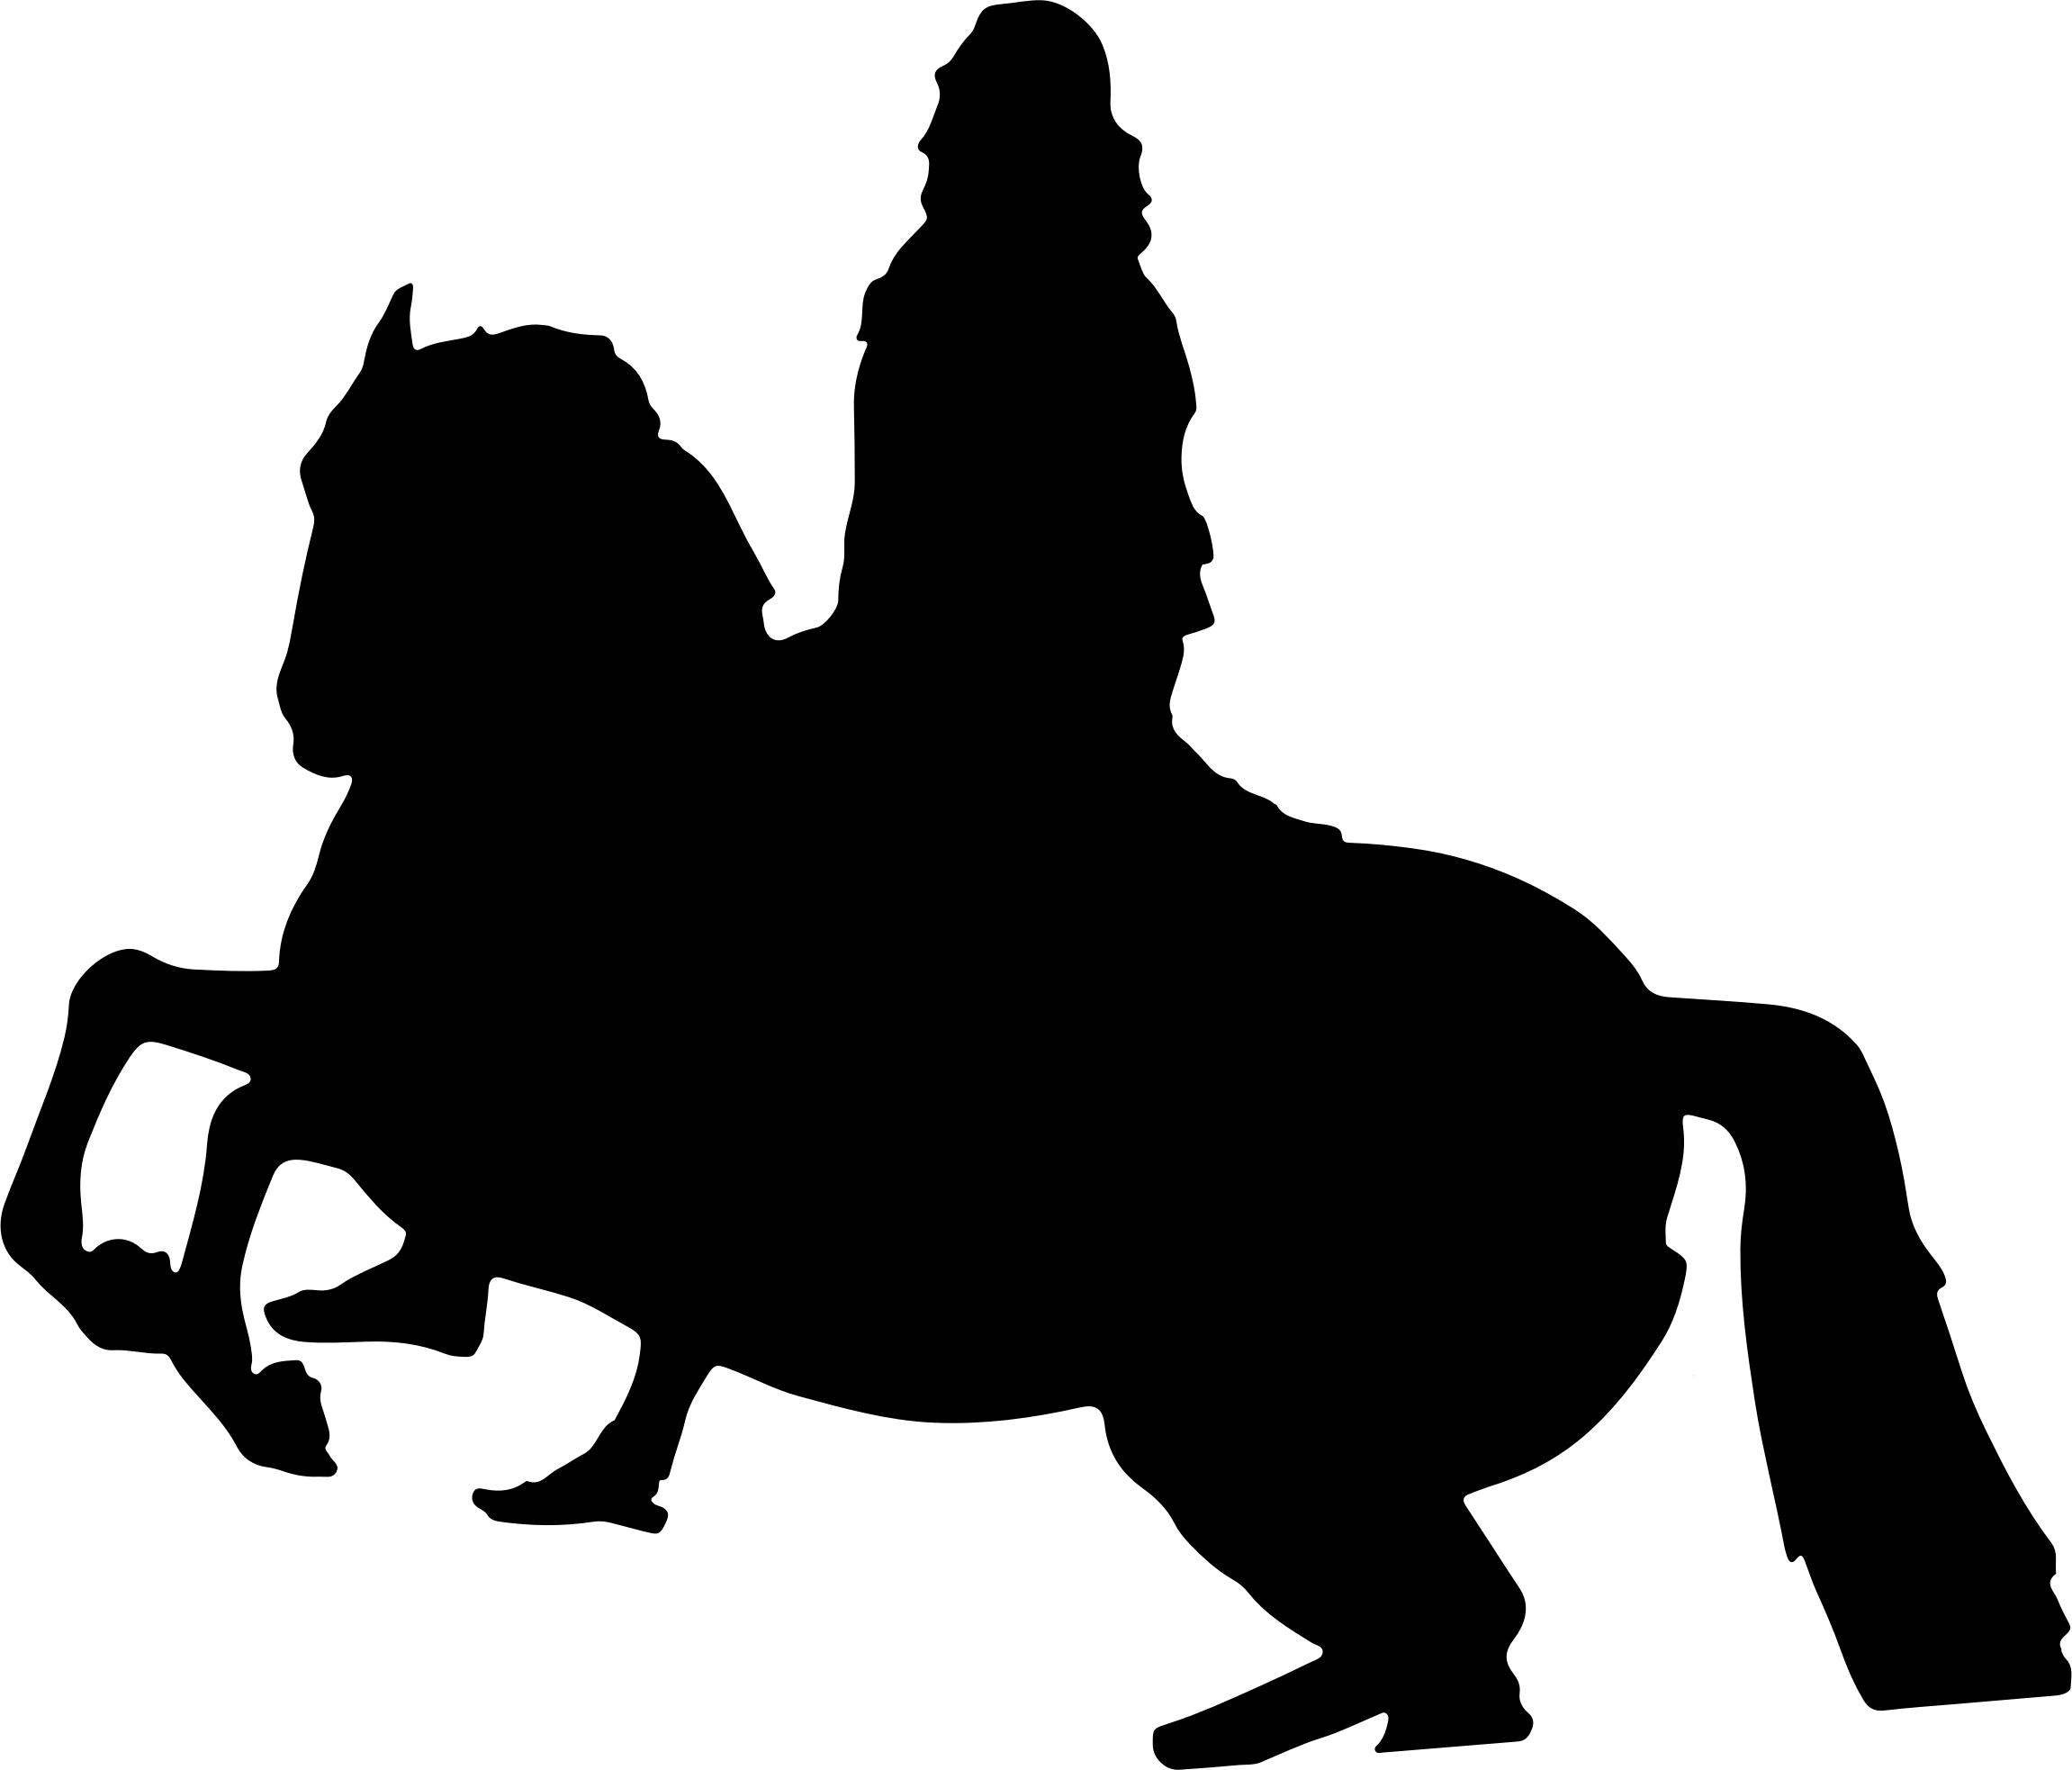 2302x1966 Clipart